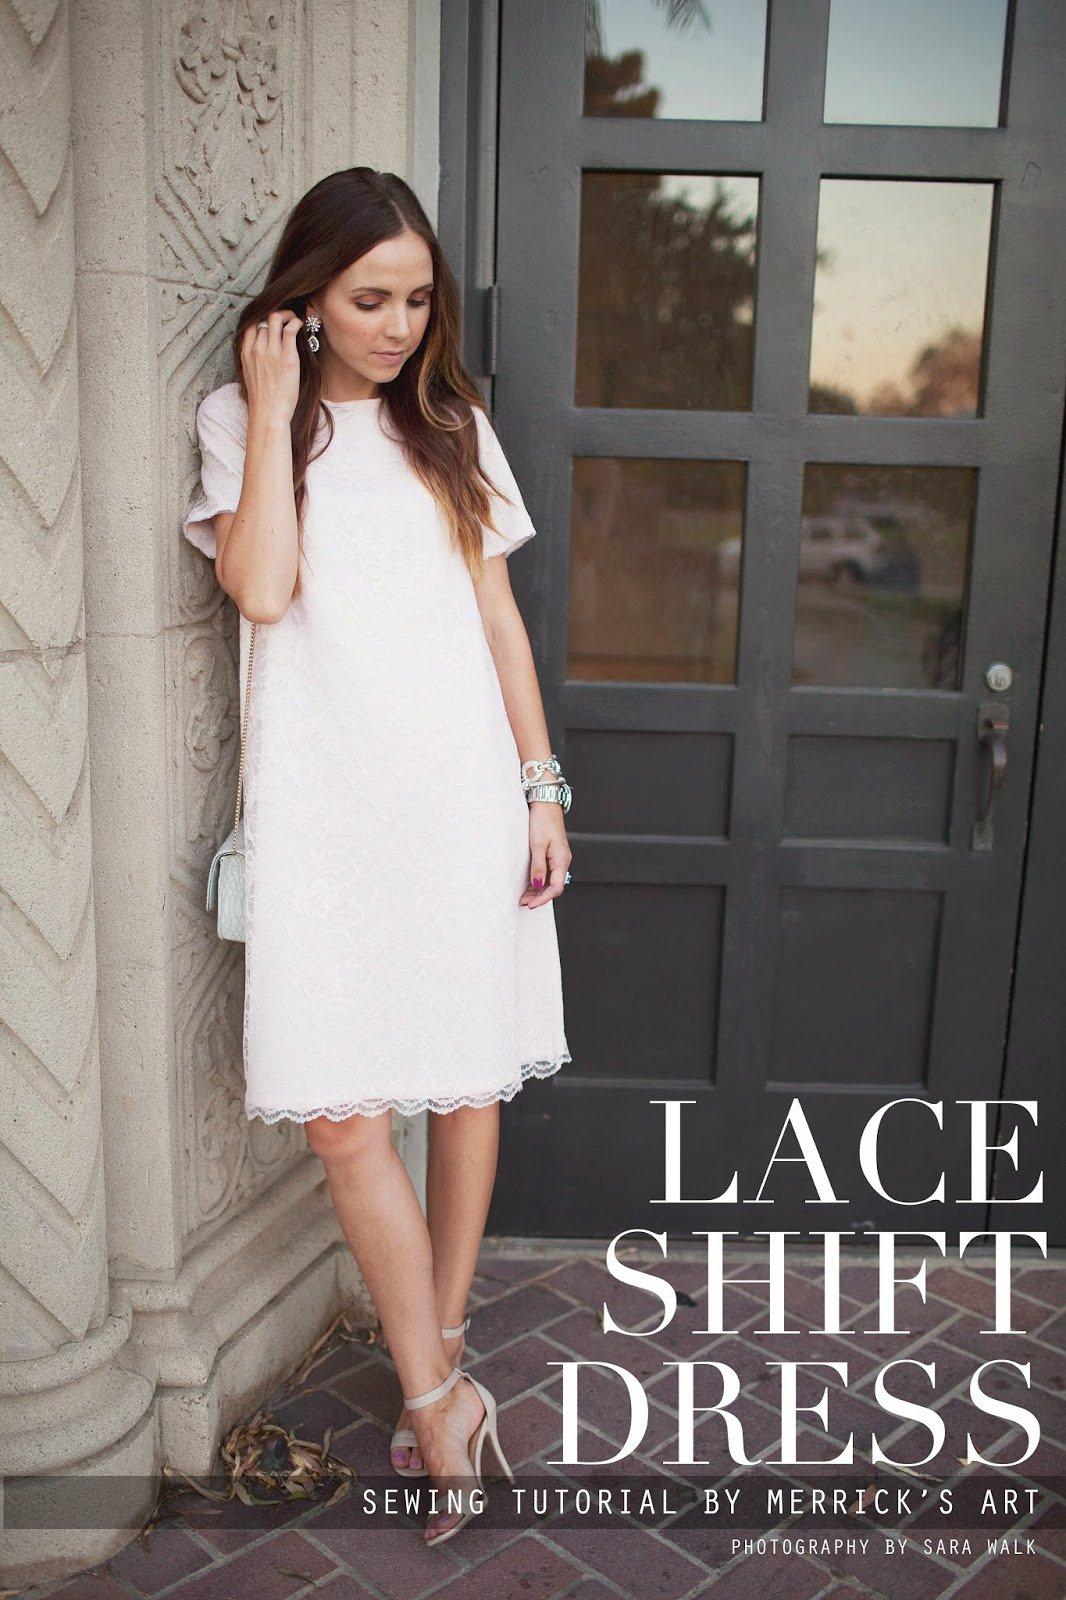 Plus Size Wedding Dress Patterns To Sew 86 Unique Merrick us Art Style